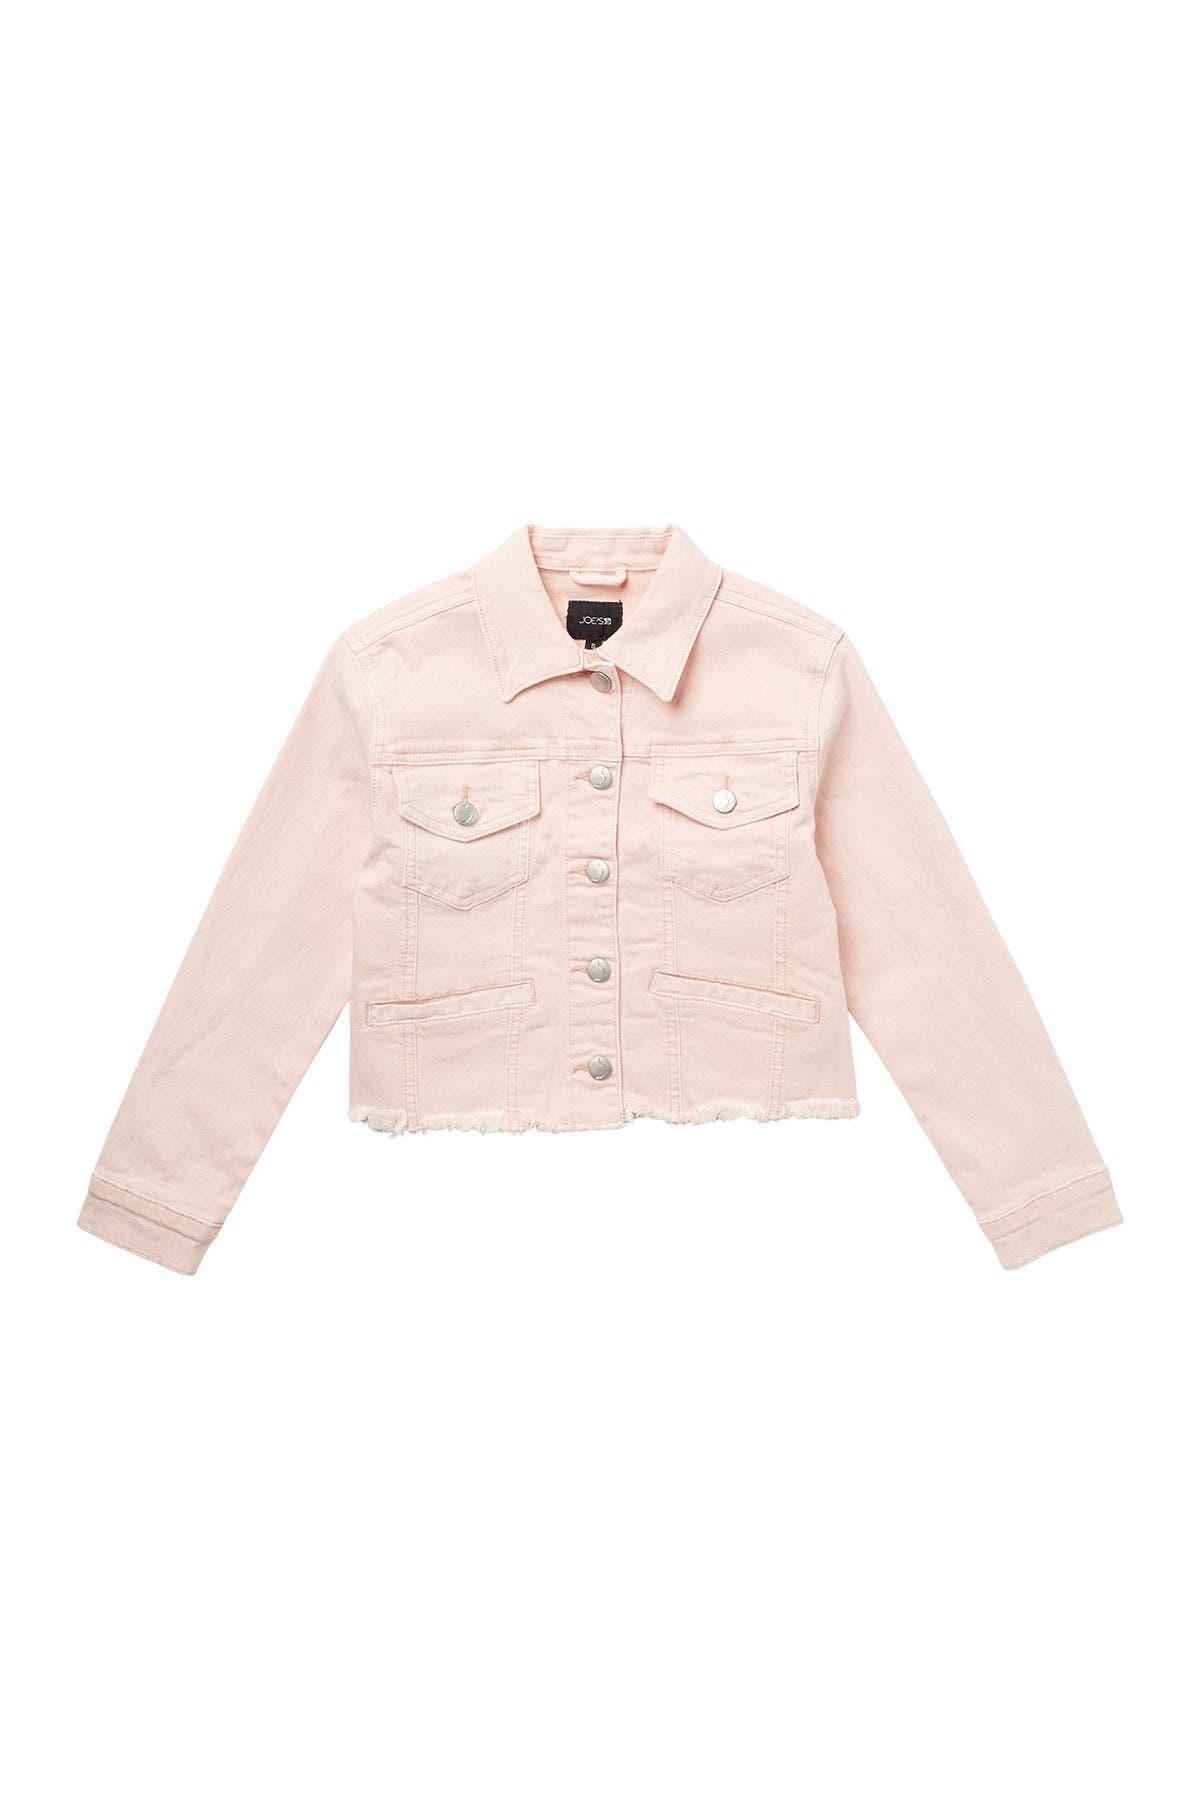 Image of Joe's Jeans Crop Denim Jacket